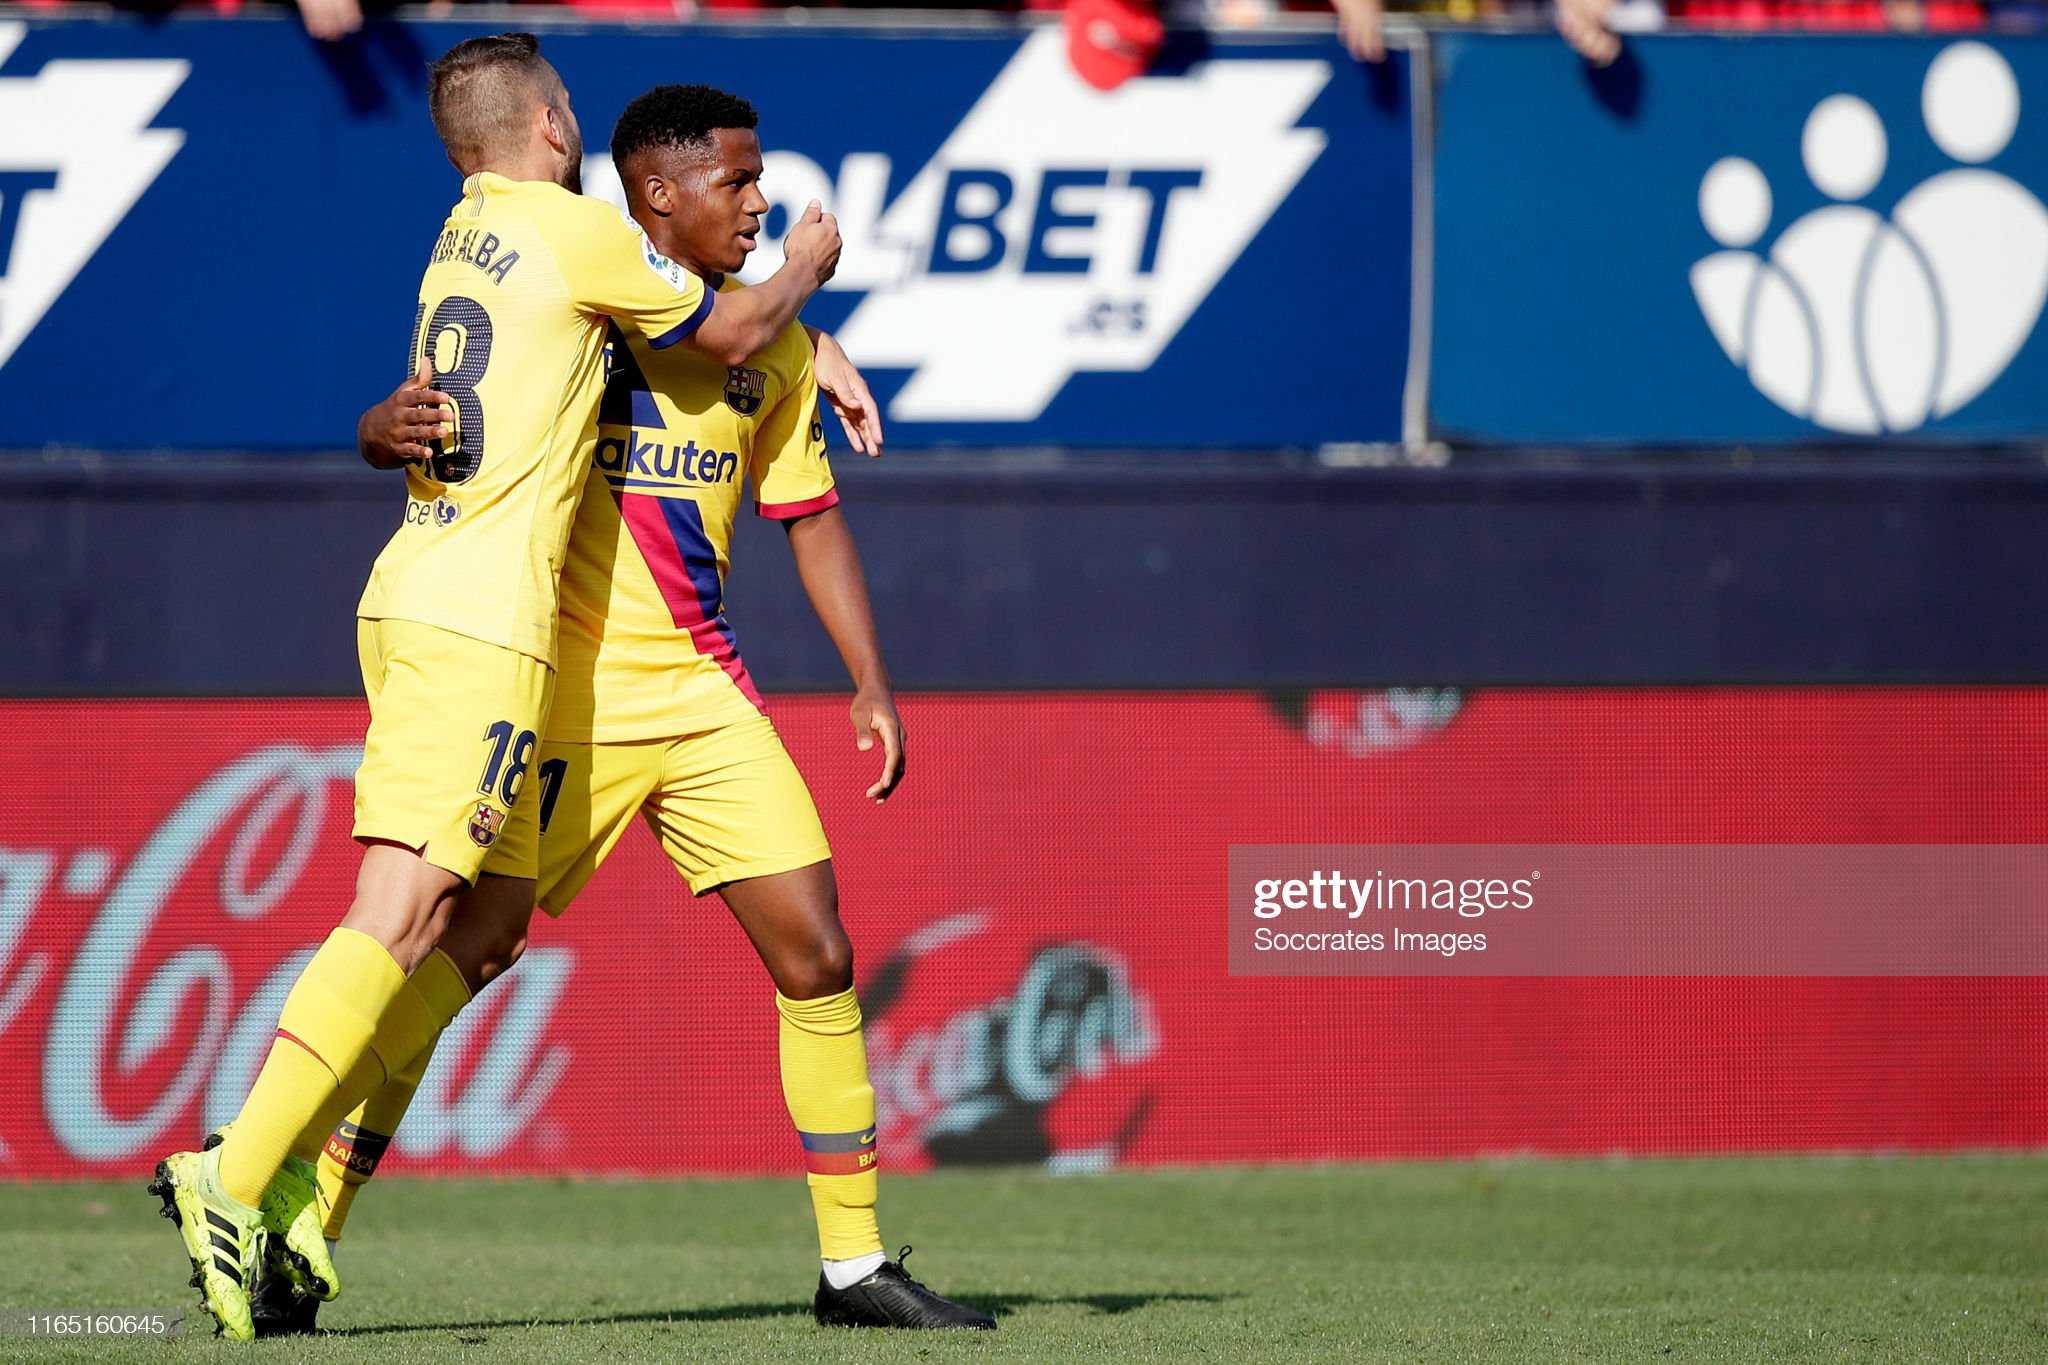 صور مباراة : أوساسونا - برشلونة 2-2 ( 31-08-2019 )  Ansu-fati-of-fc-barcelona-celebrates-with-jordi-alba-of-fc-barcelona-picture-id1165160645?s=2048x2048